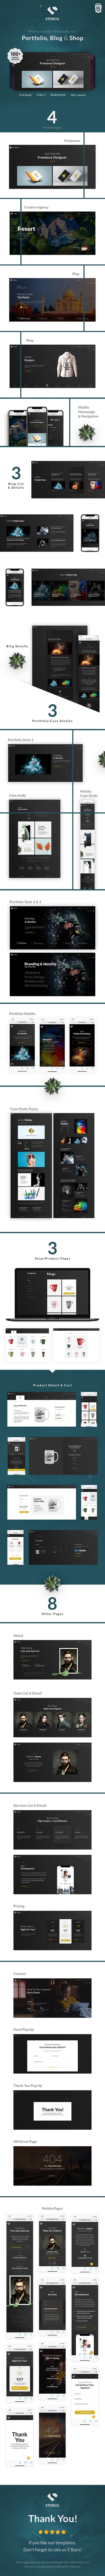 Stencil HTML - Portfolio, Blogging & Shop - 1